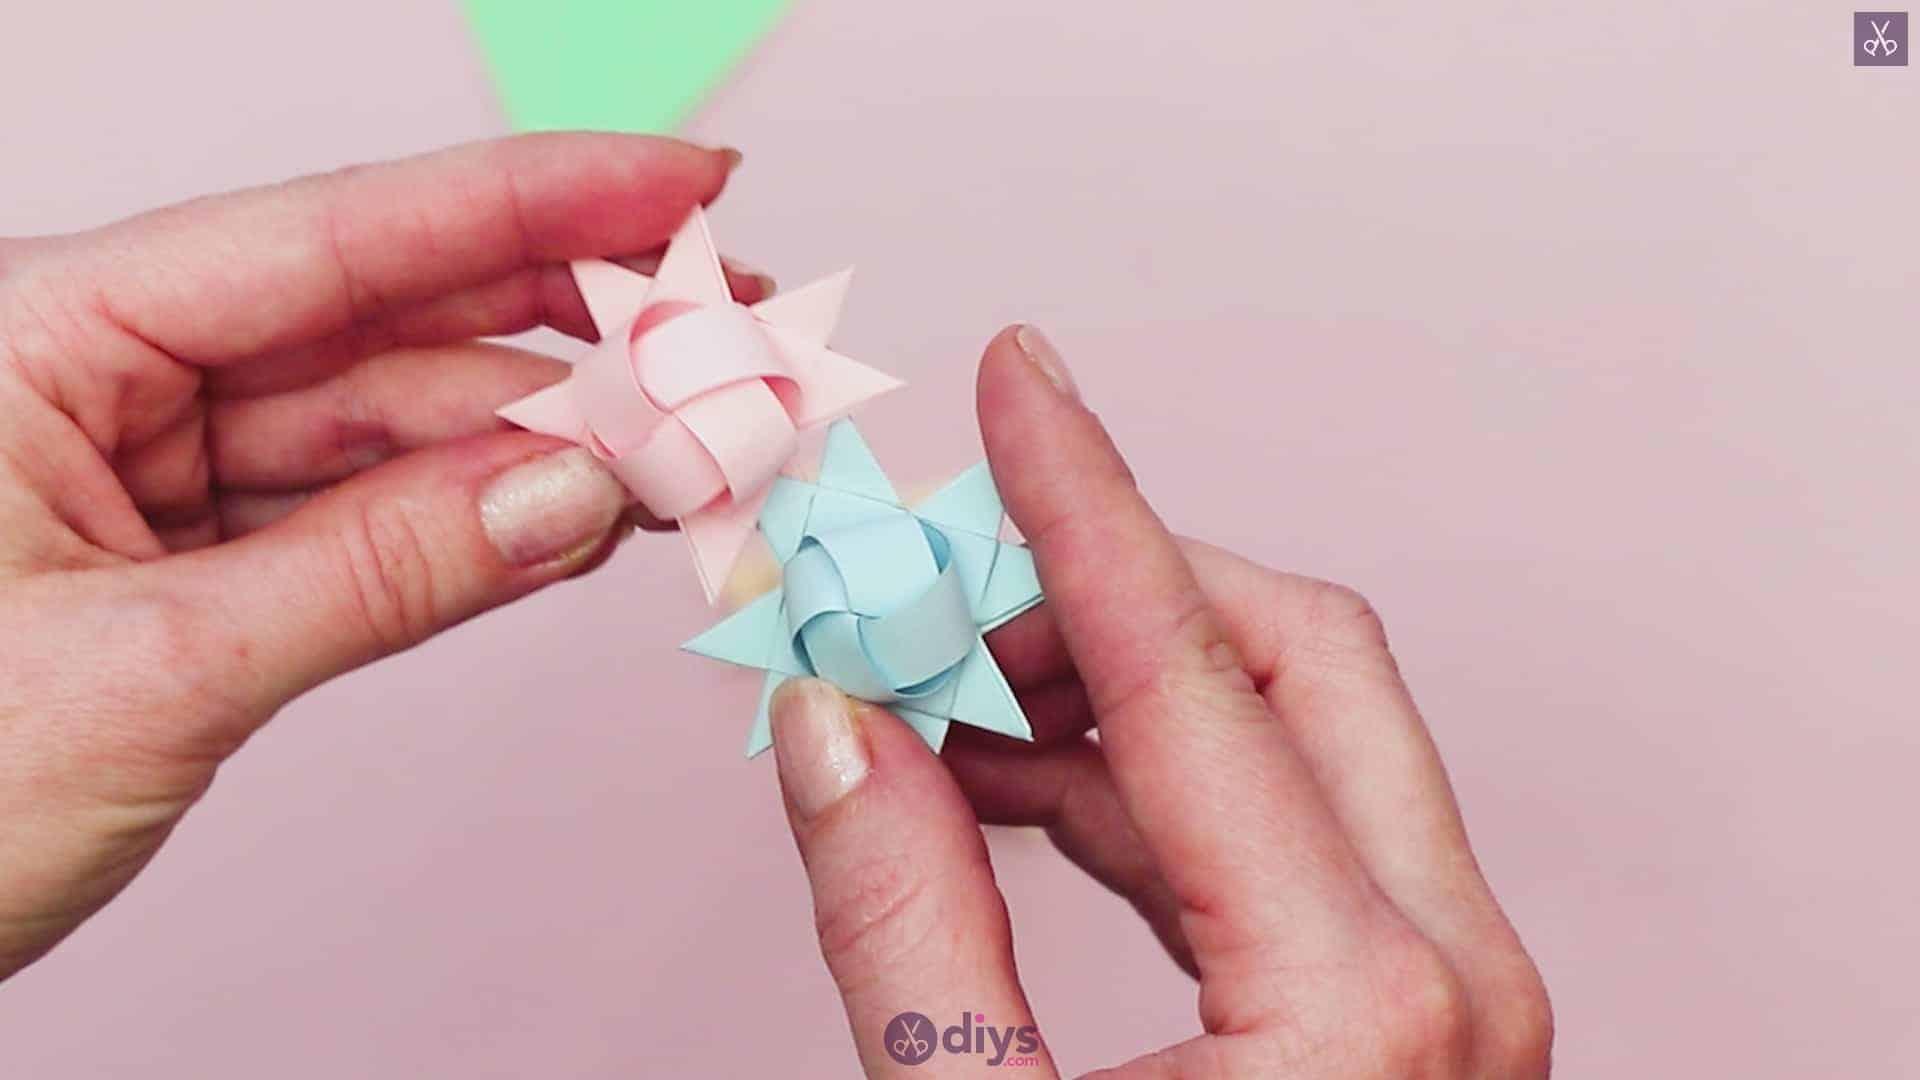 Diy origami flower art step 9a